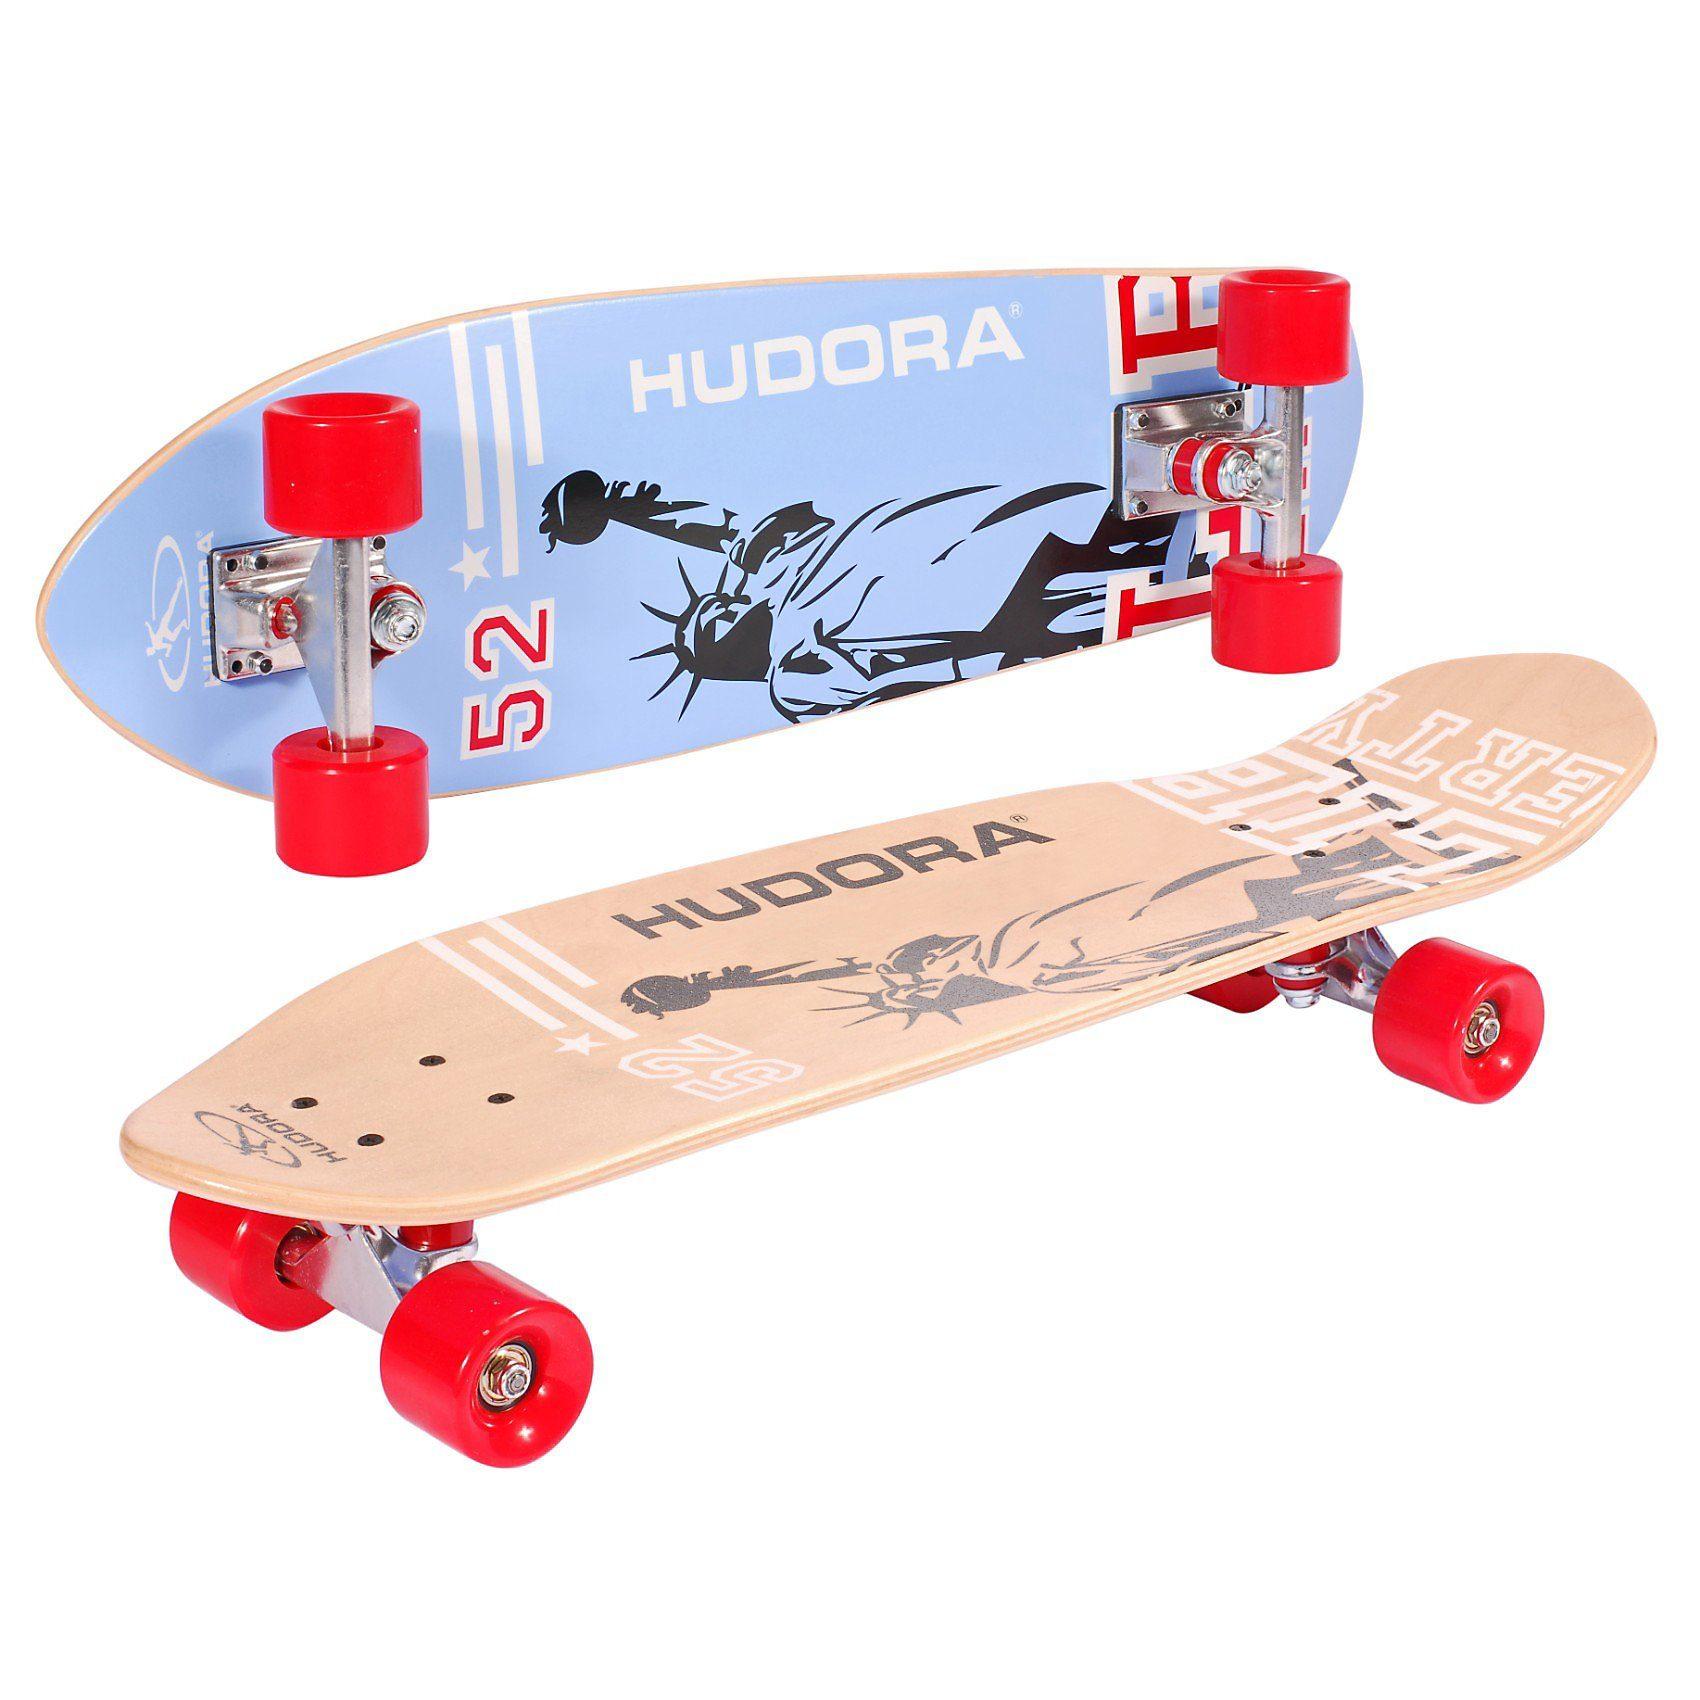 Hudora Skateboard Cruiser ABEC 7